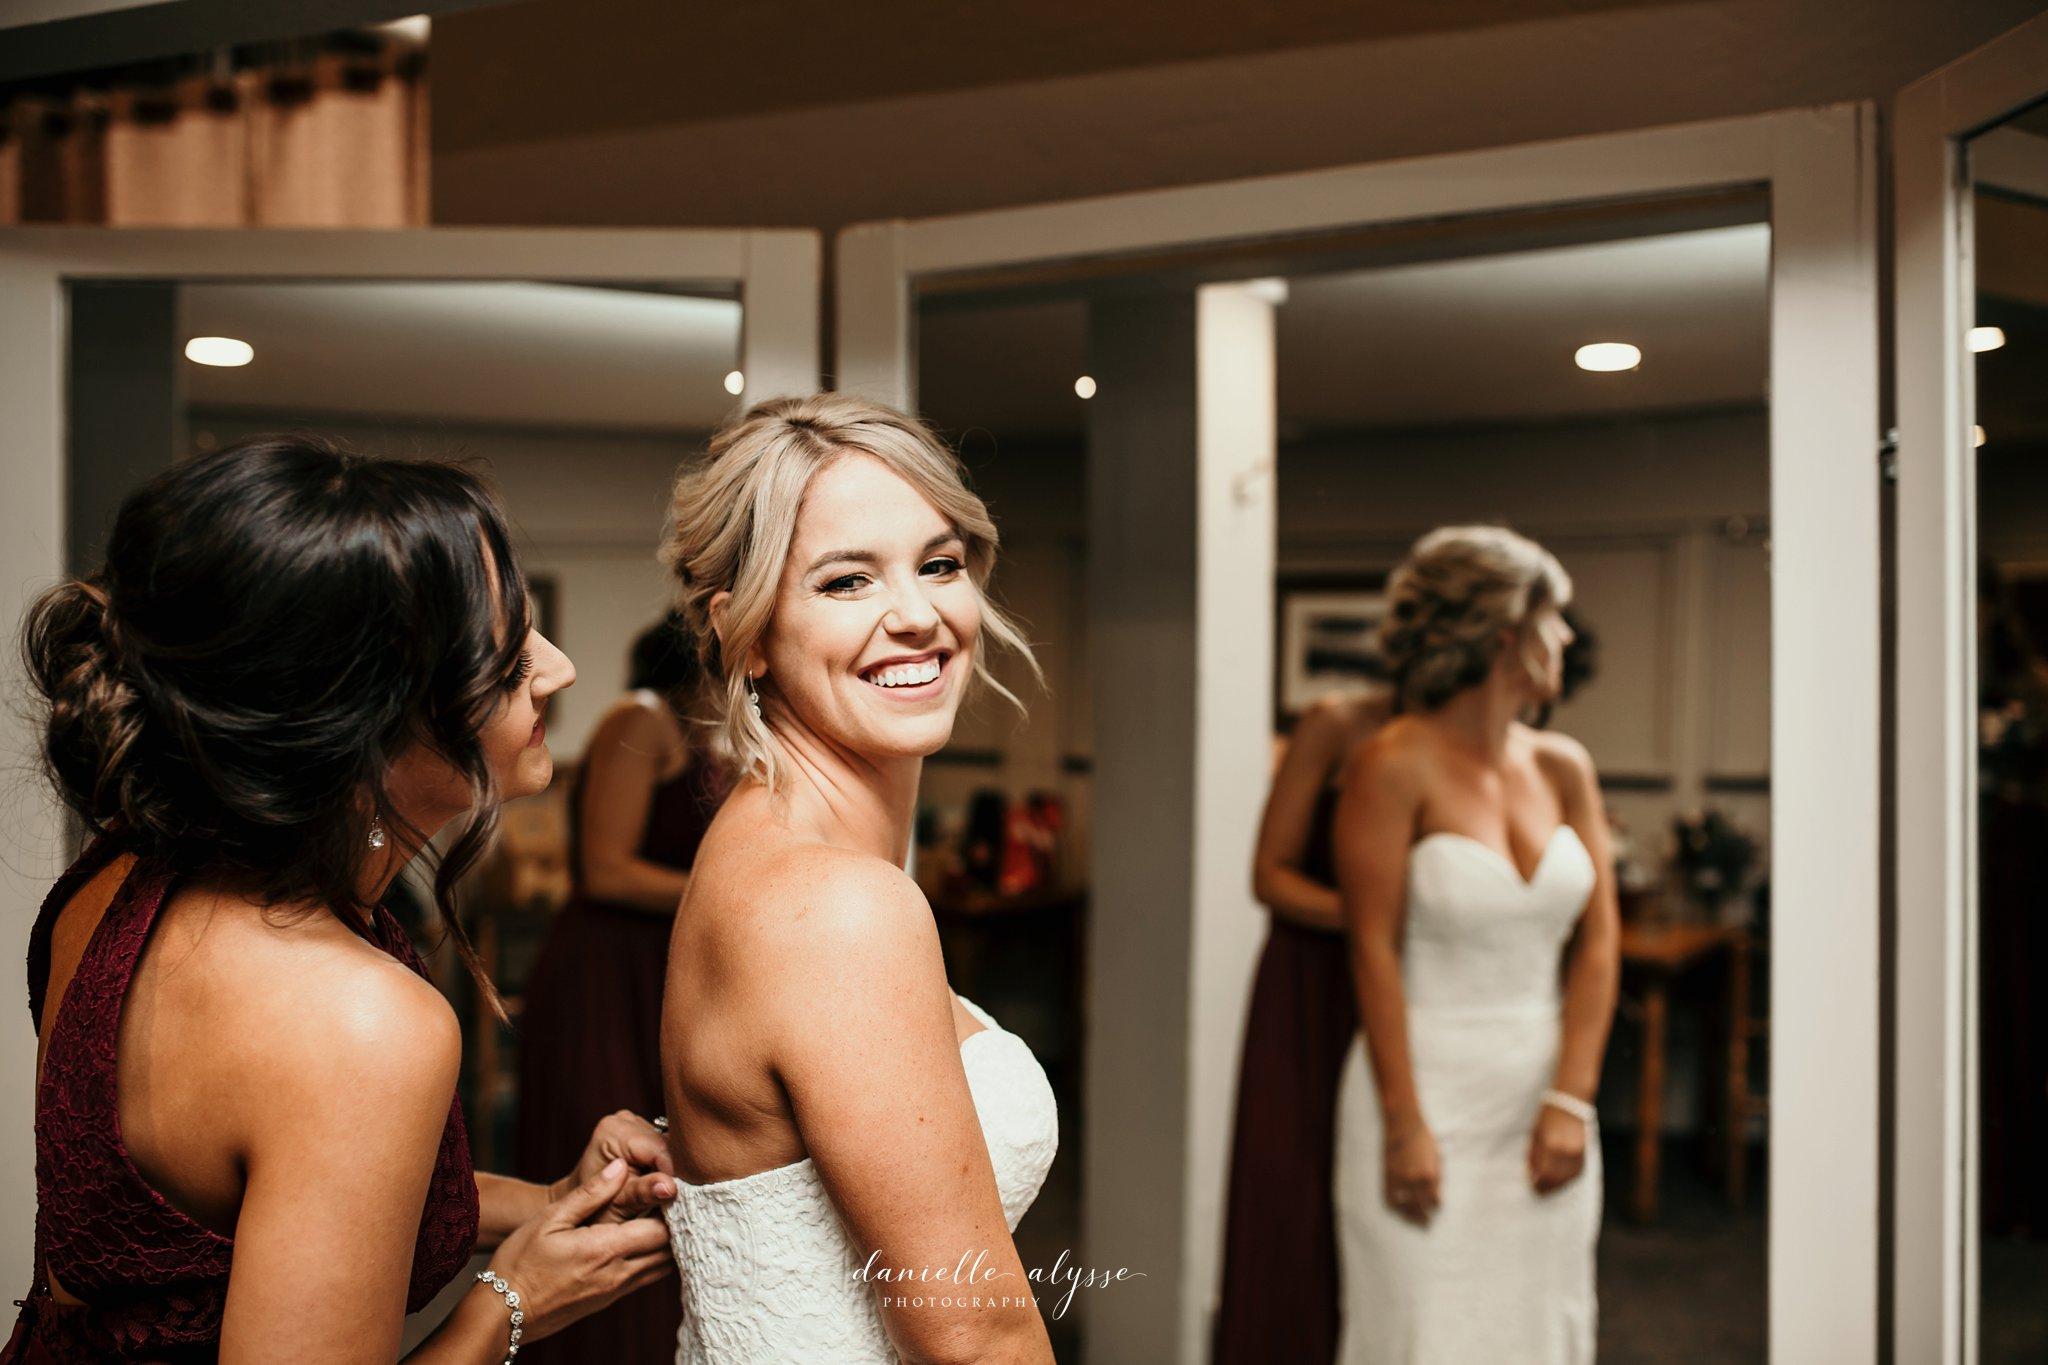 180831_wedding_stephanie_heavenly_south_lake_tahoe_danielle_alysse_photography_destination_blog_262_WEB.jpg